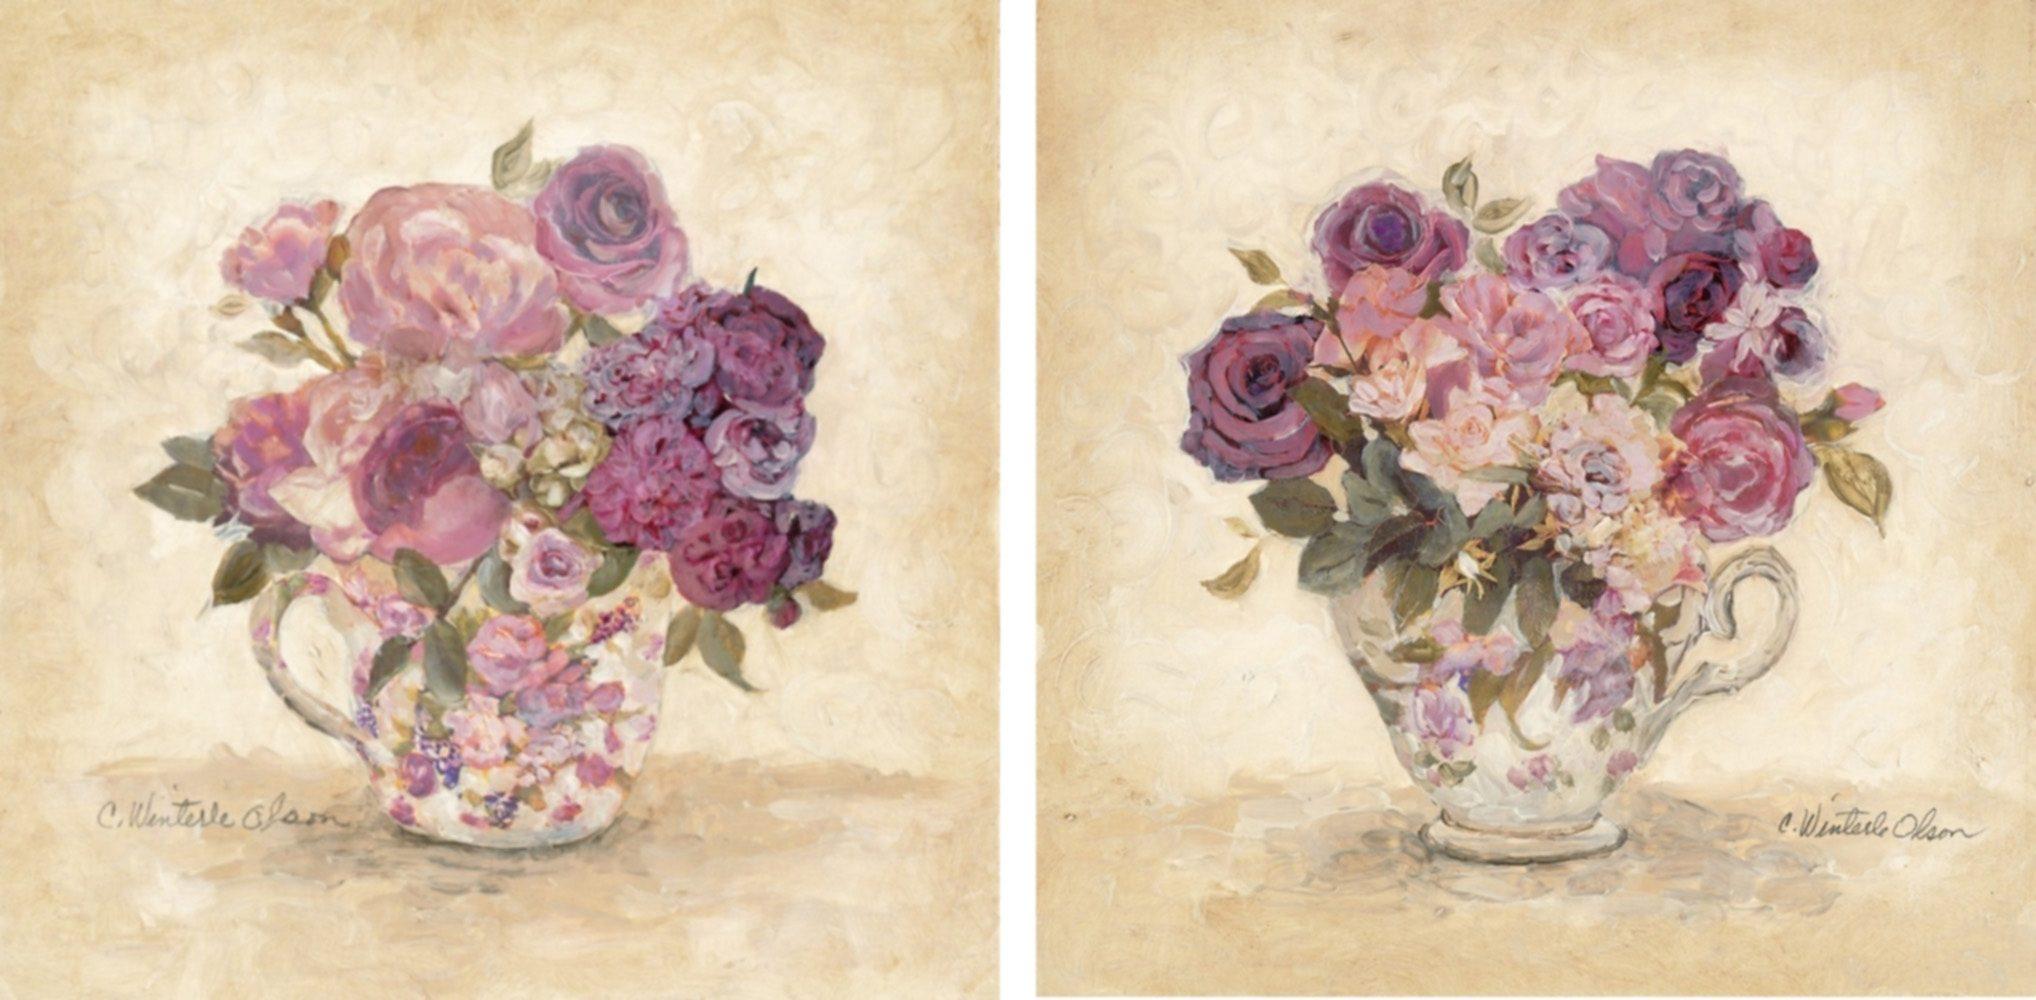 Home Affaire Bild Kunstdruck »C. Winter Olson, Blütenpracht I/II«, (2-tlg.)